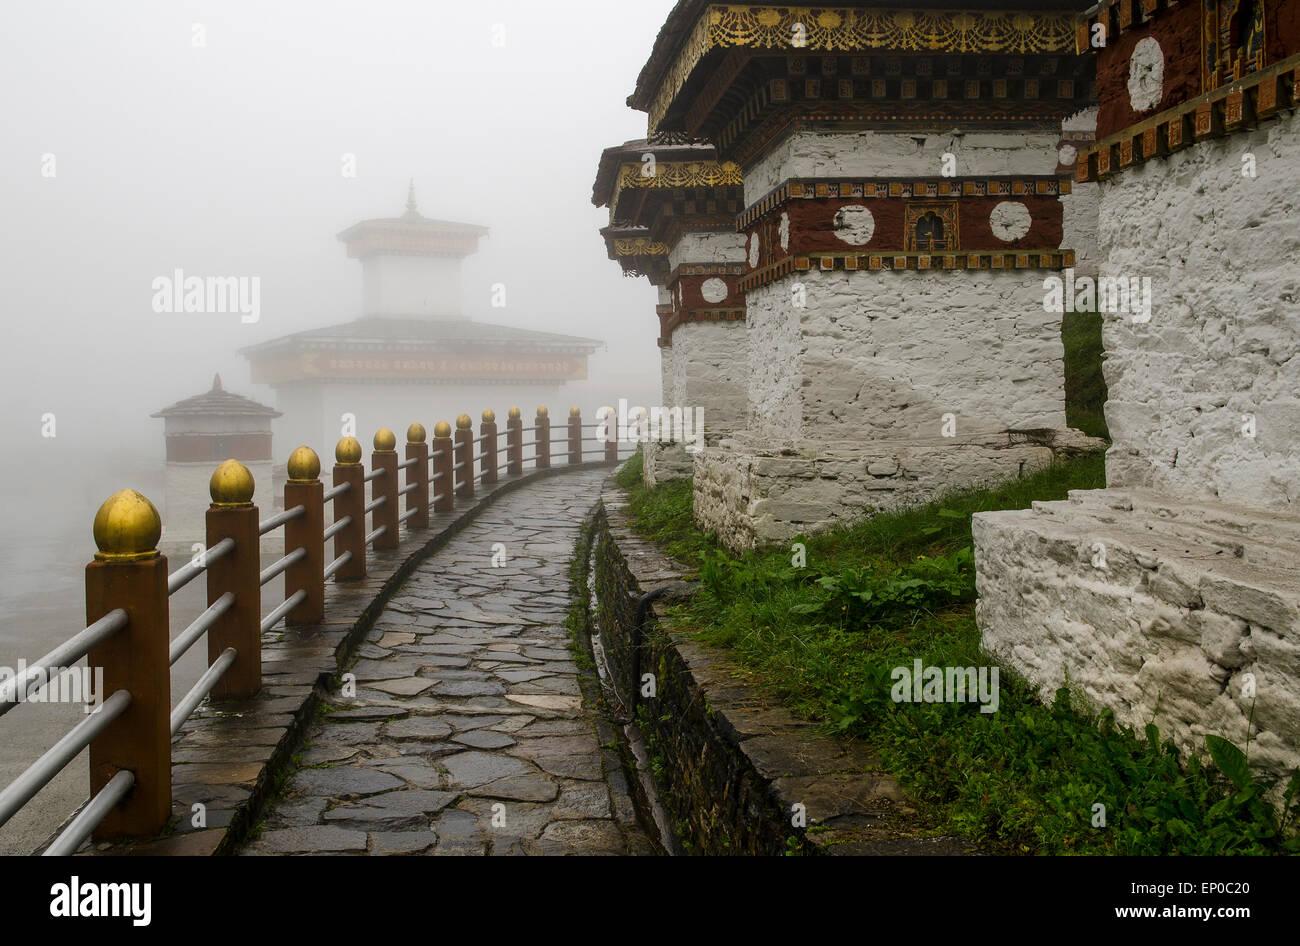 Chortens (Stupas) in fog, Dochu La Pass, Bhutan - Stock Image